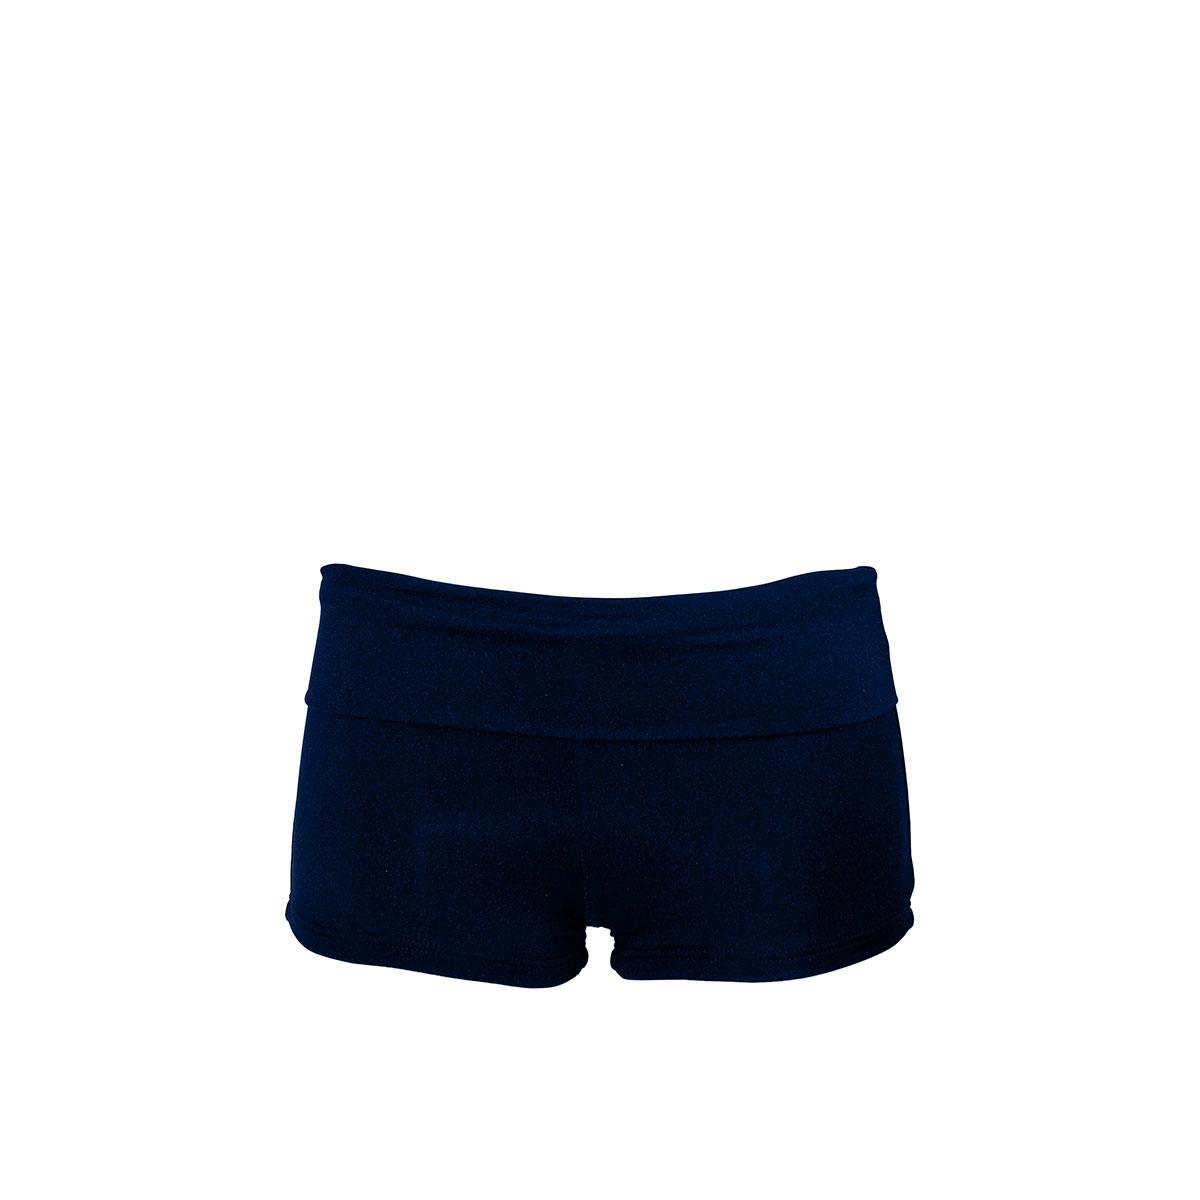 haut maillot de bain bandeau bleu marine indigo maillots de bain maillot de bain bandeau www. Black Bedroom Furniture Sets. Home Design Ideas